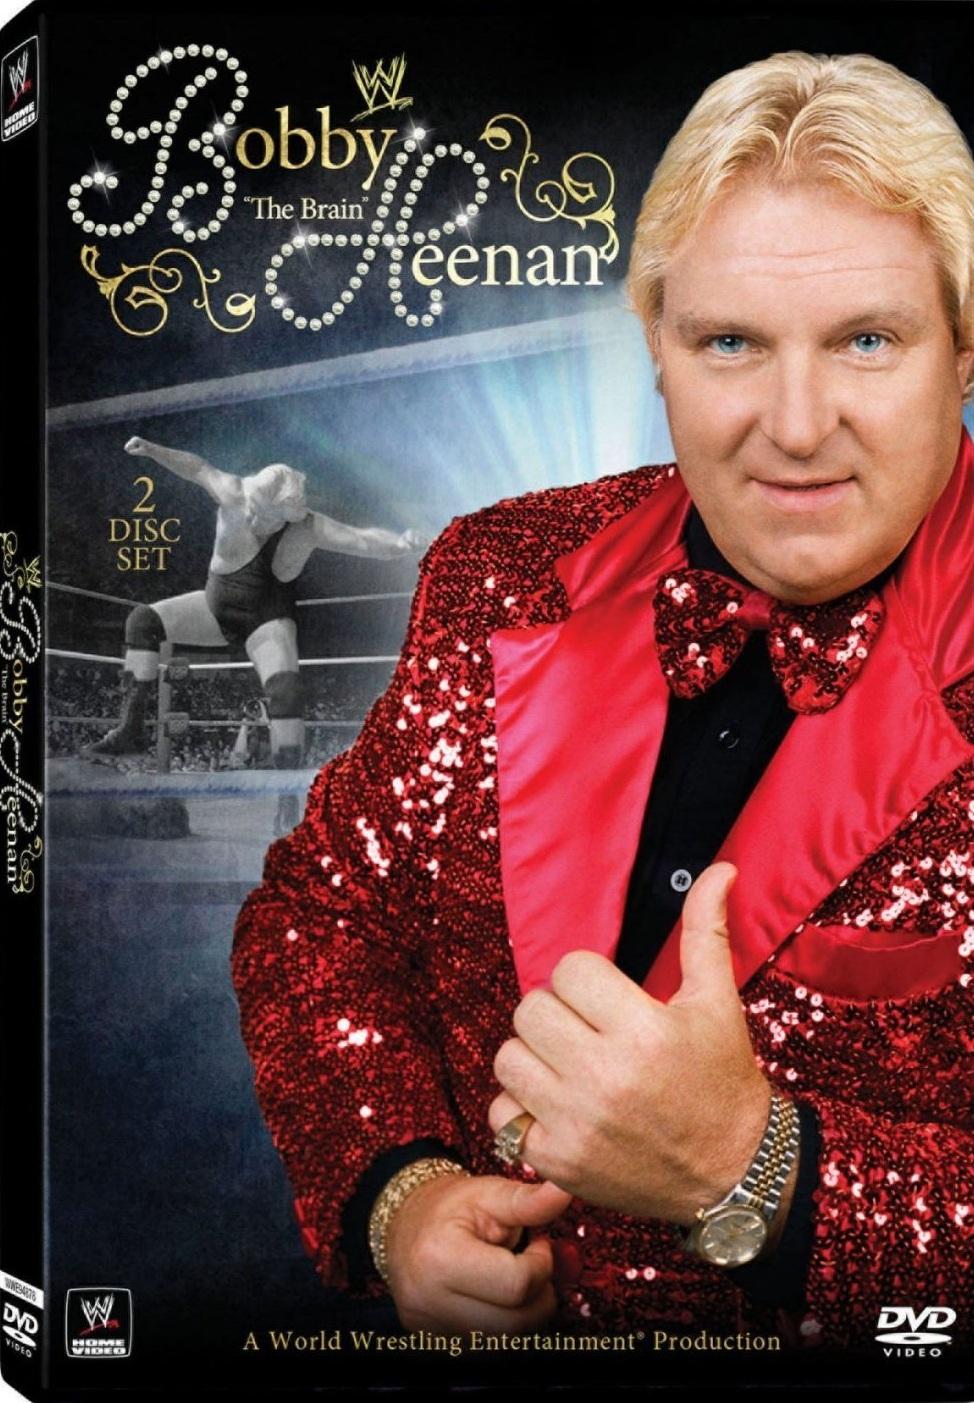 Bobby Heenan in WWE: Bobby 'The Brain' Heenan (2010)